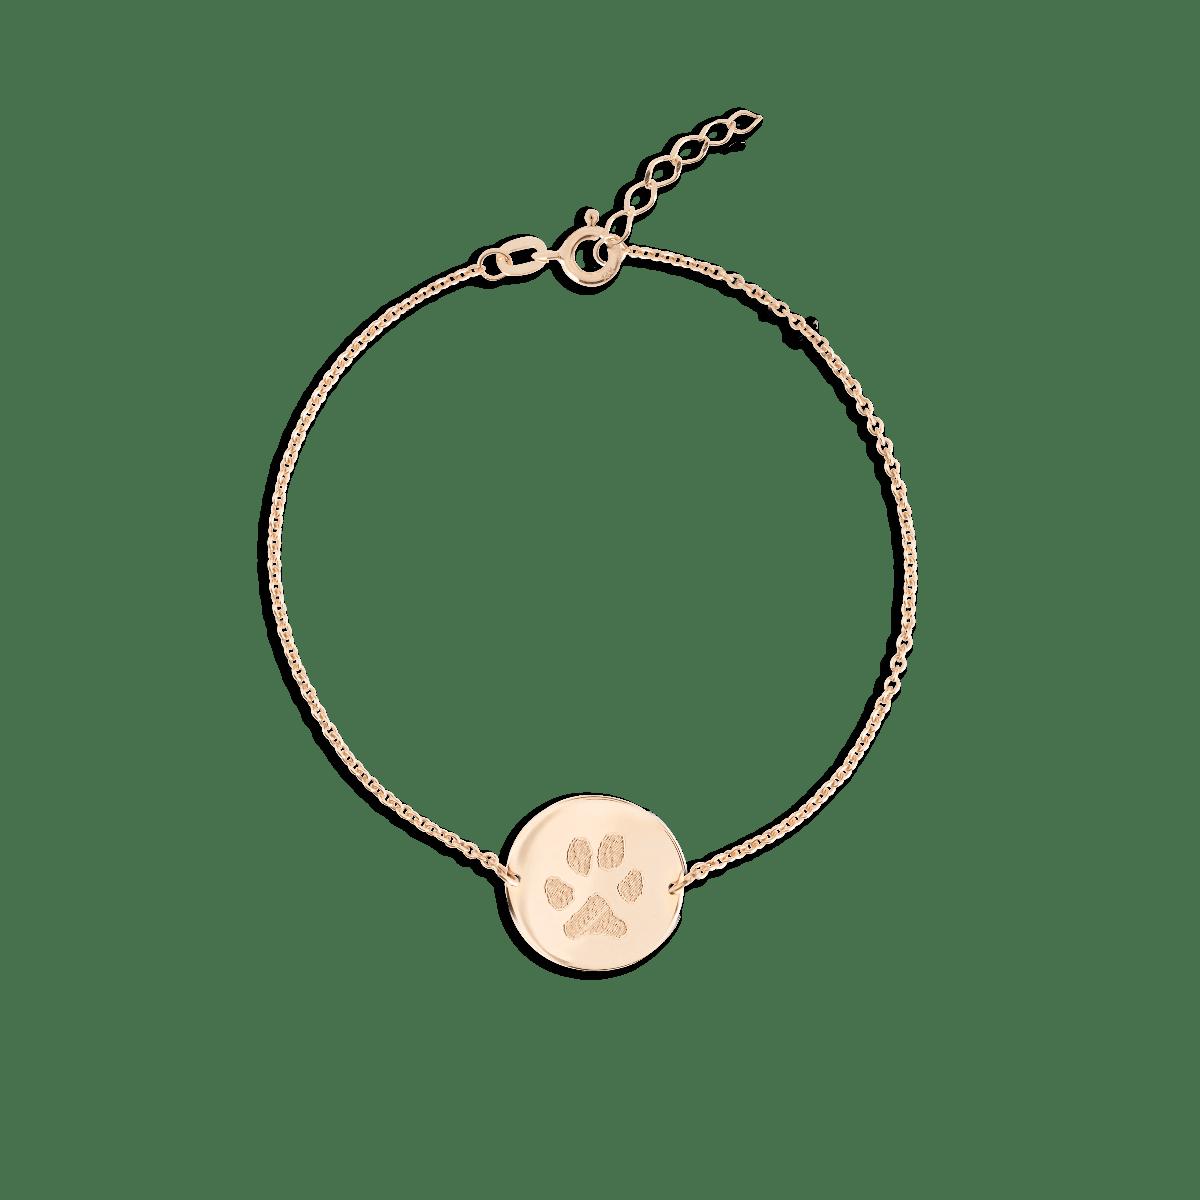 Paw Print Coin Bracelet